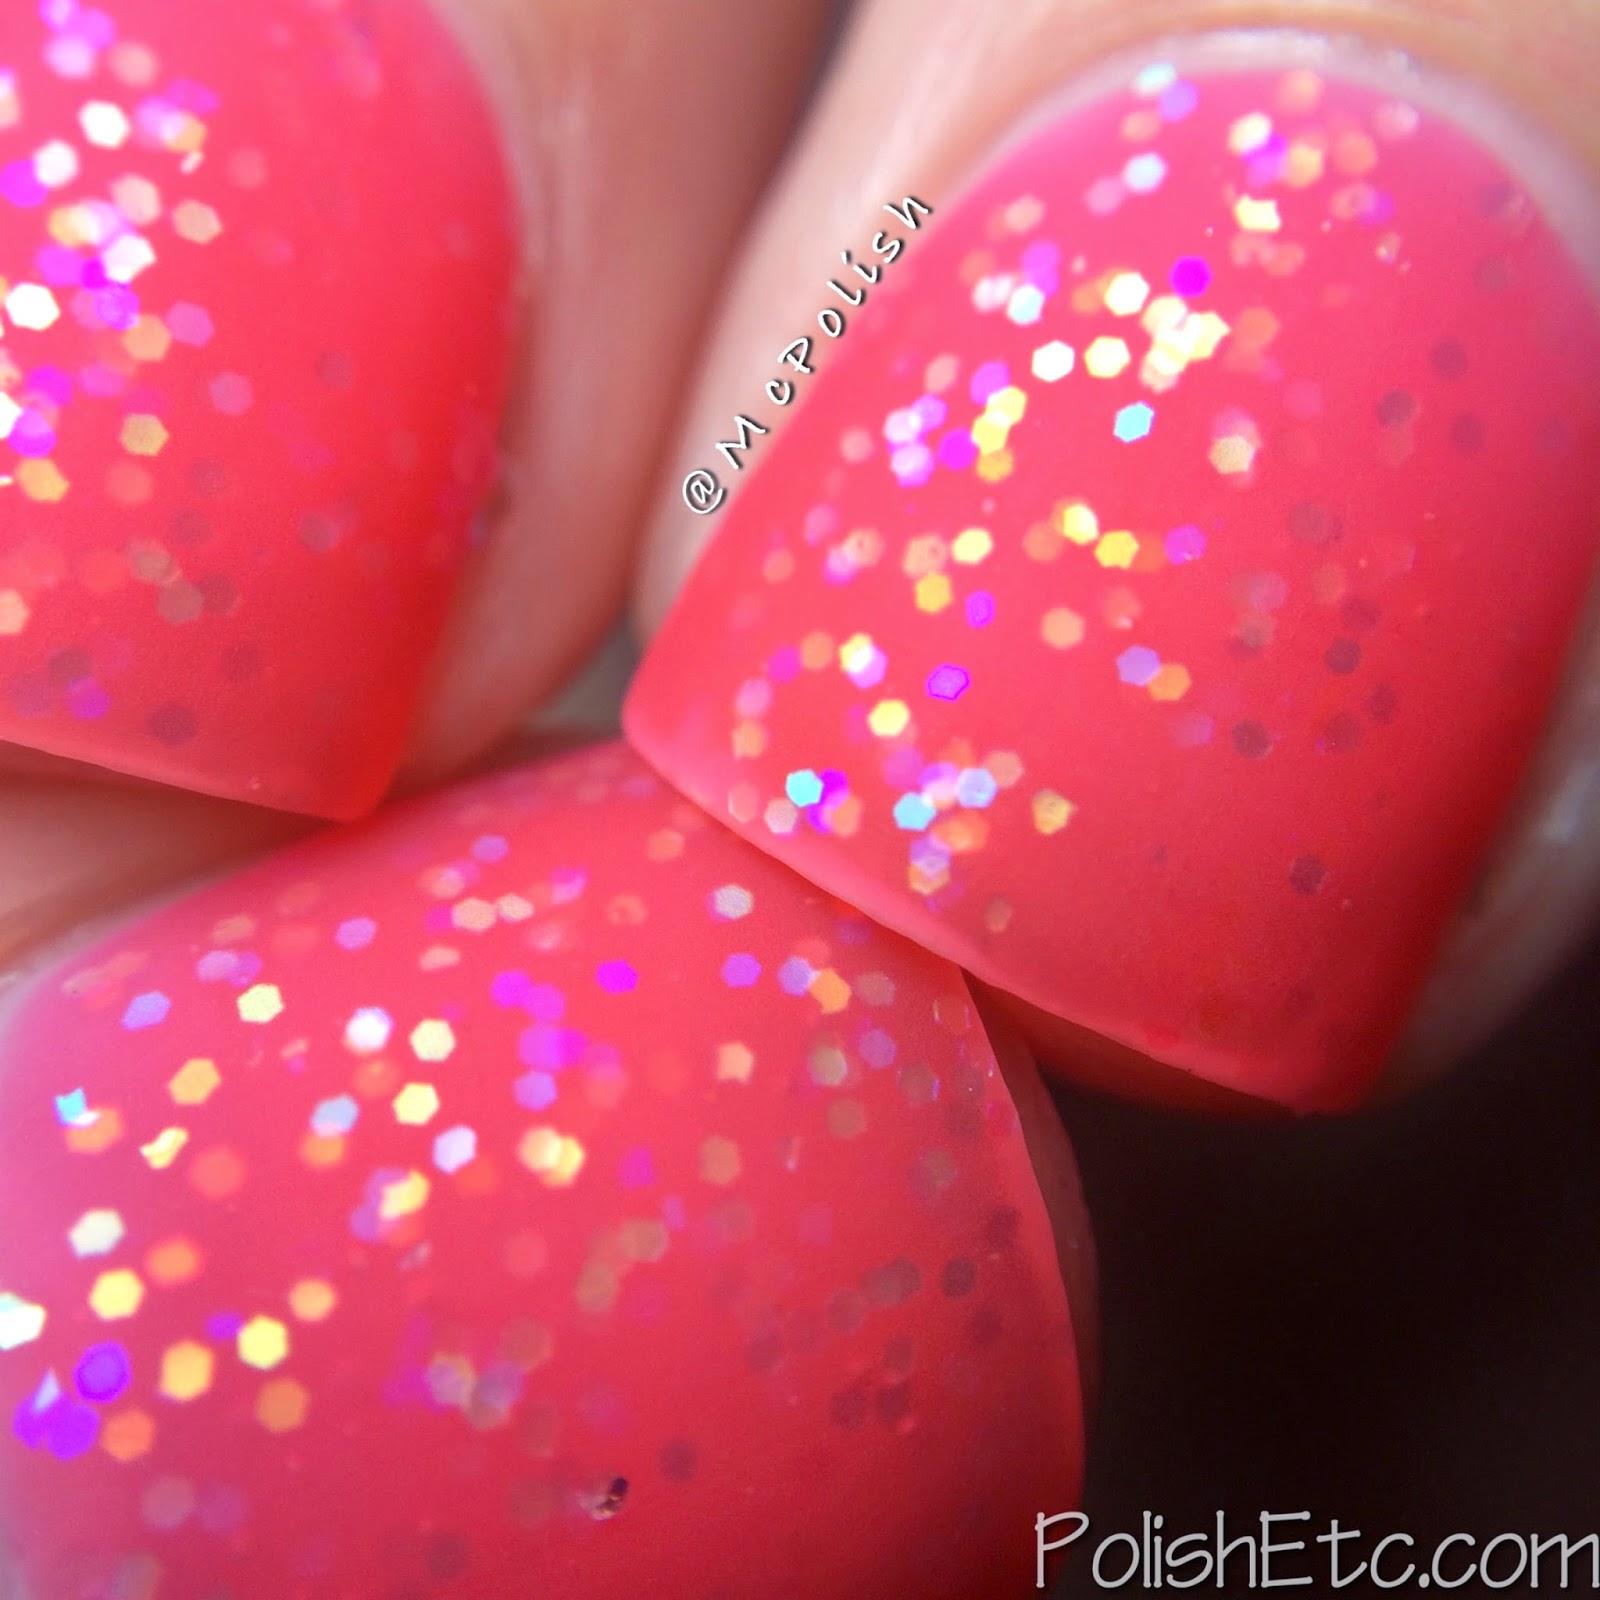 Pure Ice - New Year New Hue Jellies - Rosy Glow - McPolish - Matte Macro